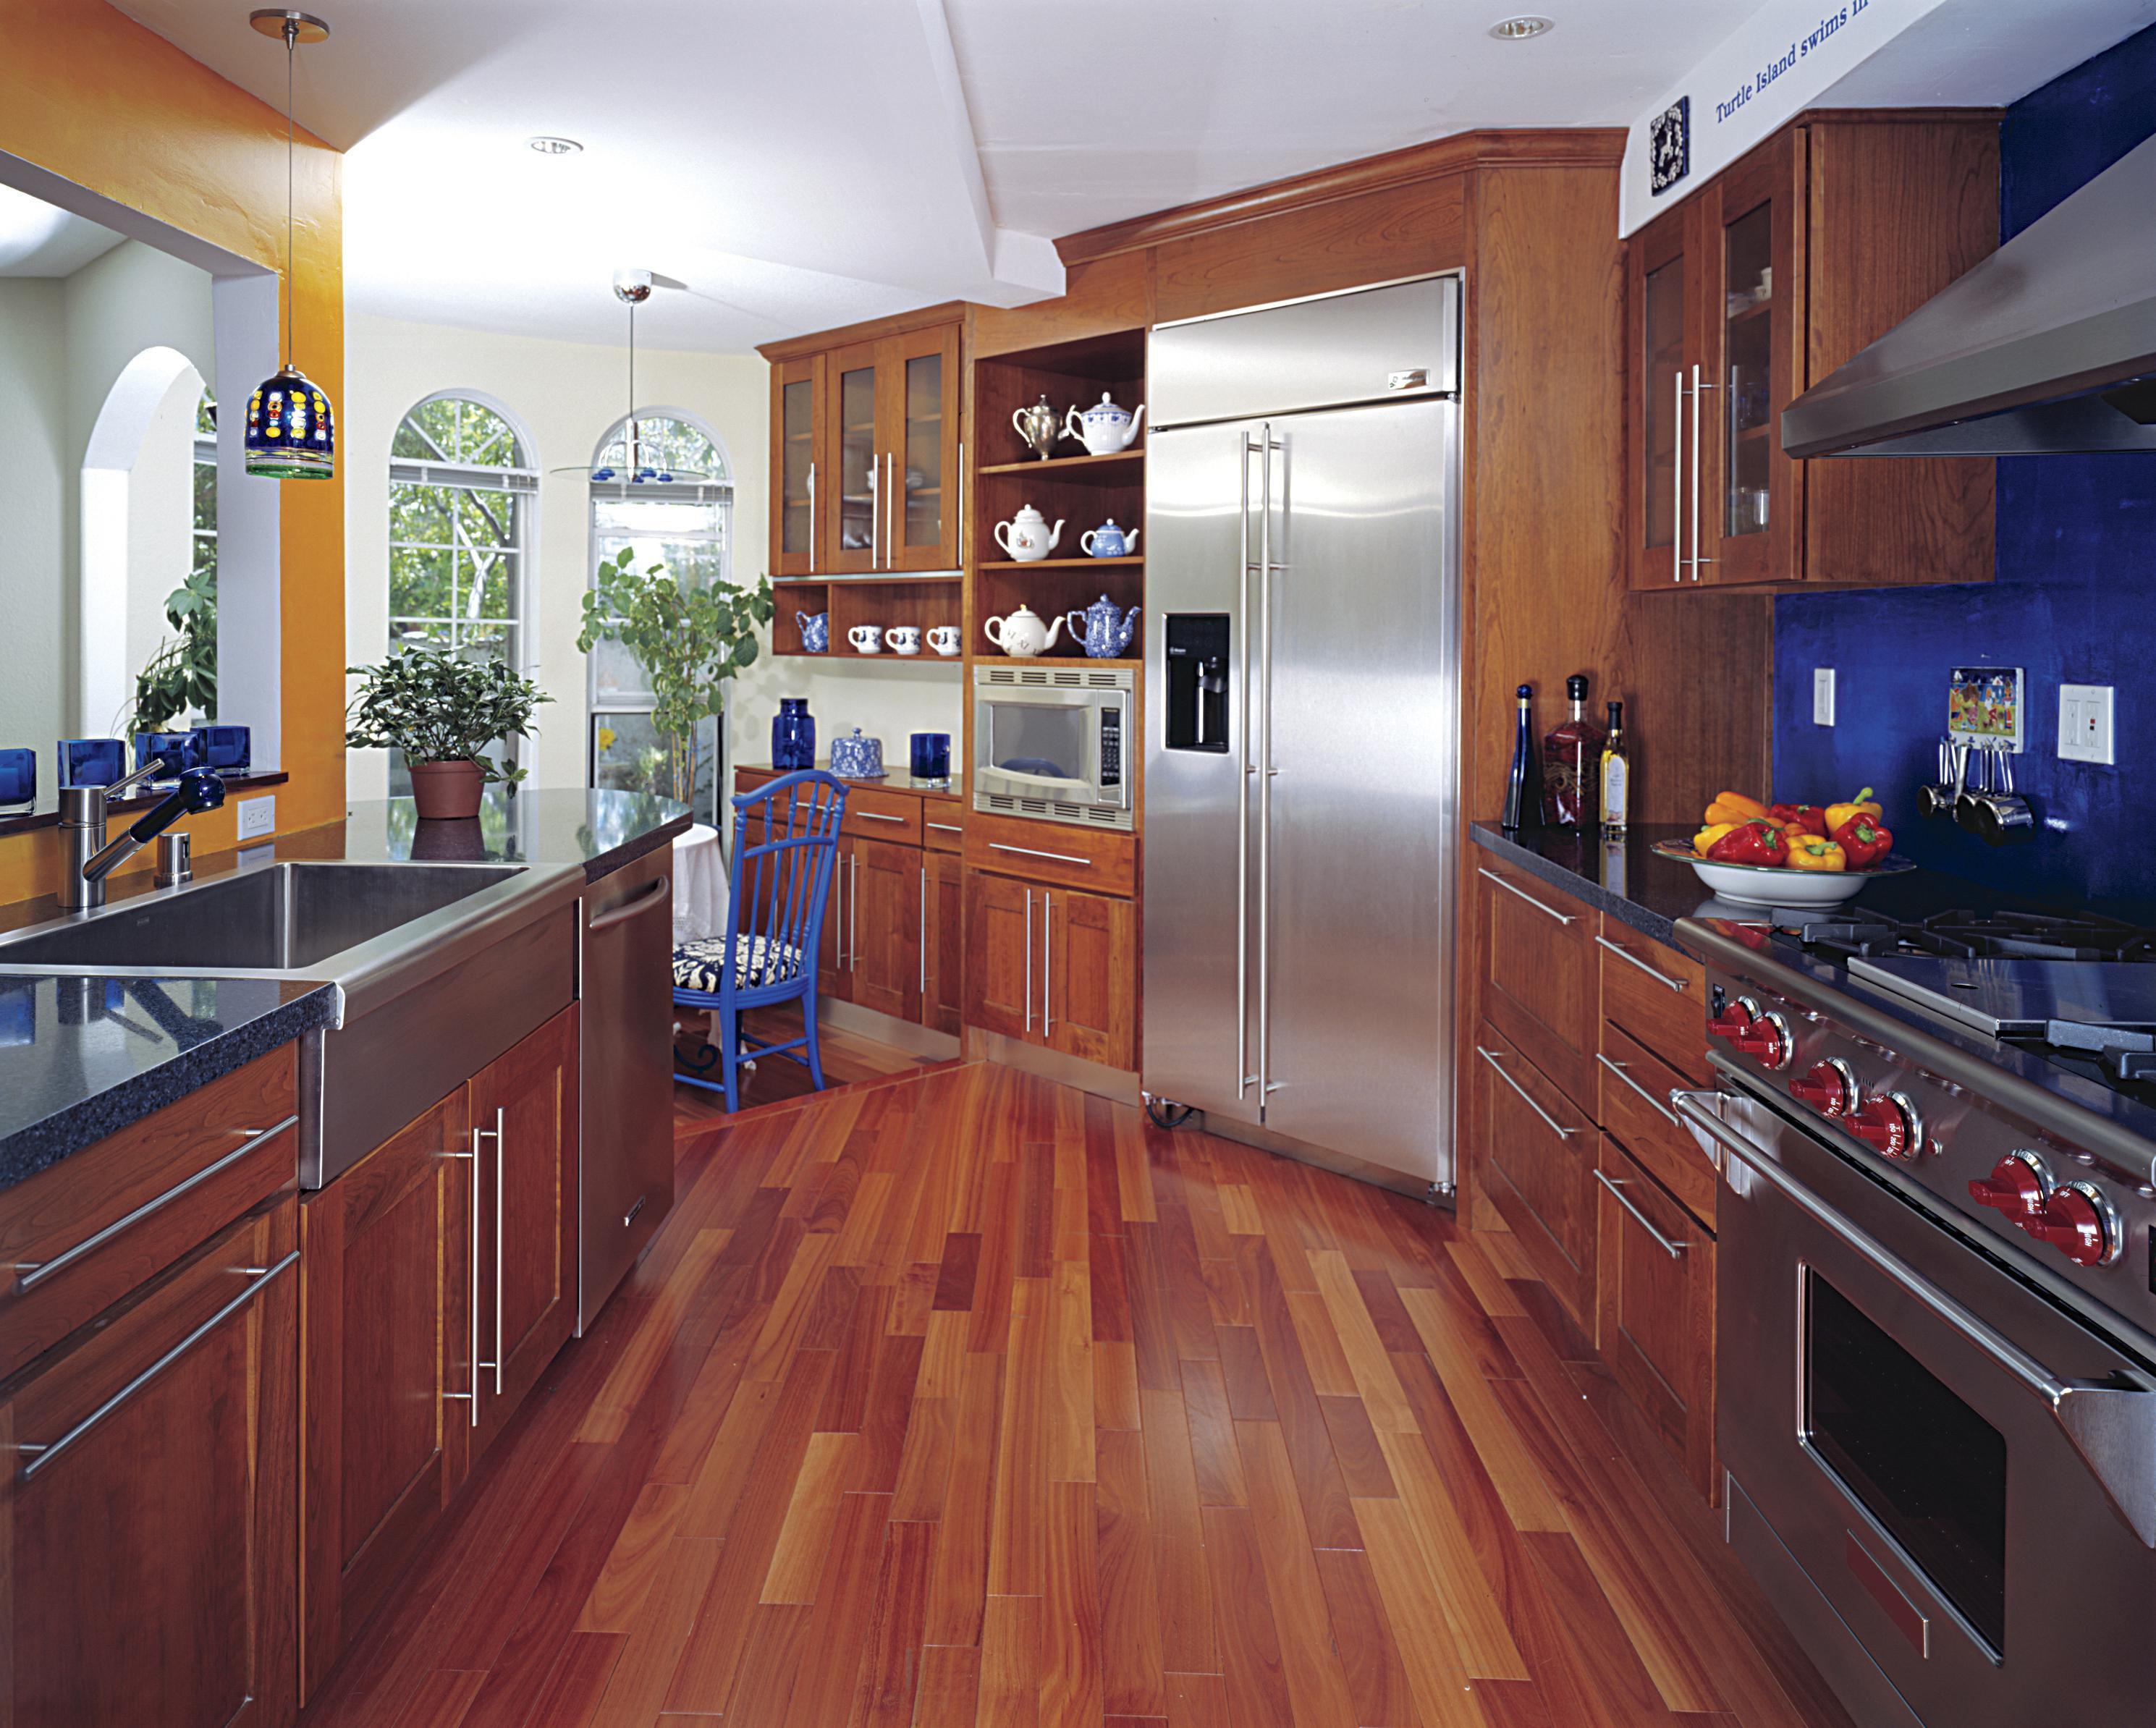 3 8 hardwood flooring reviews of hardwood floor in a kitchen is this allowed with 186828472 56a49f3a5f9b58b7d0d7e142